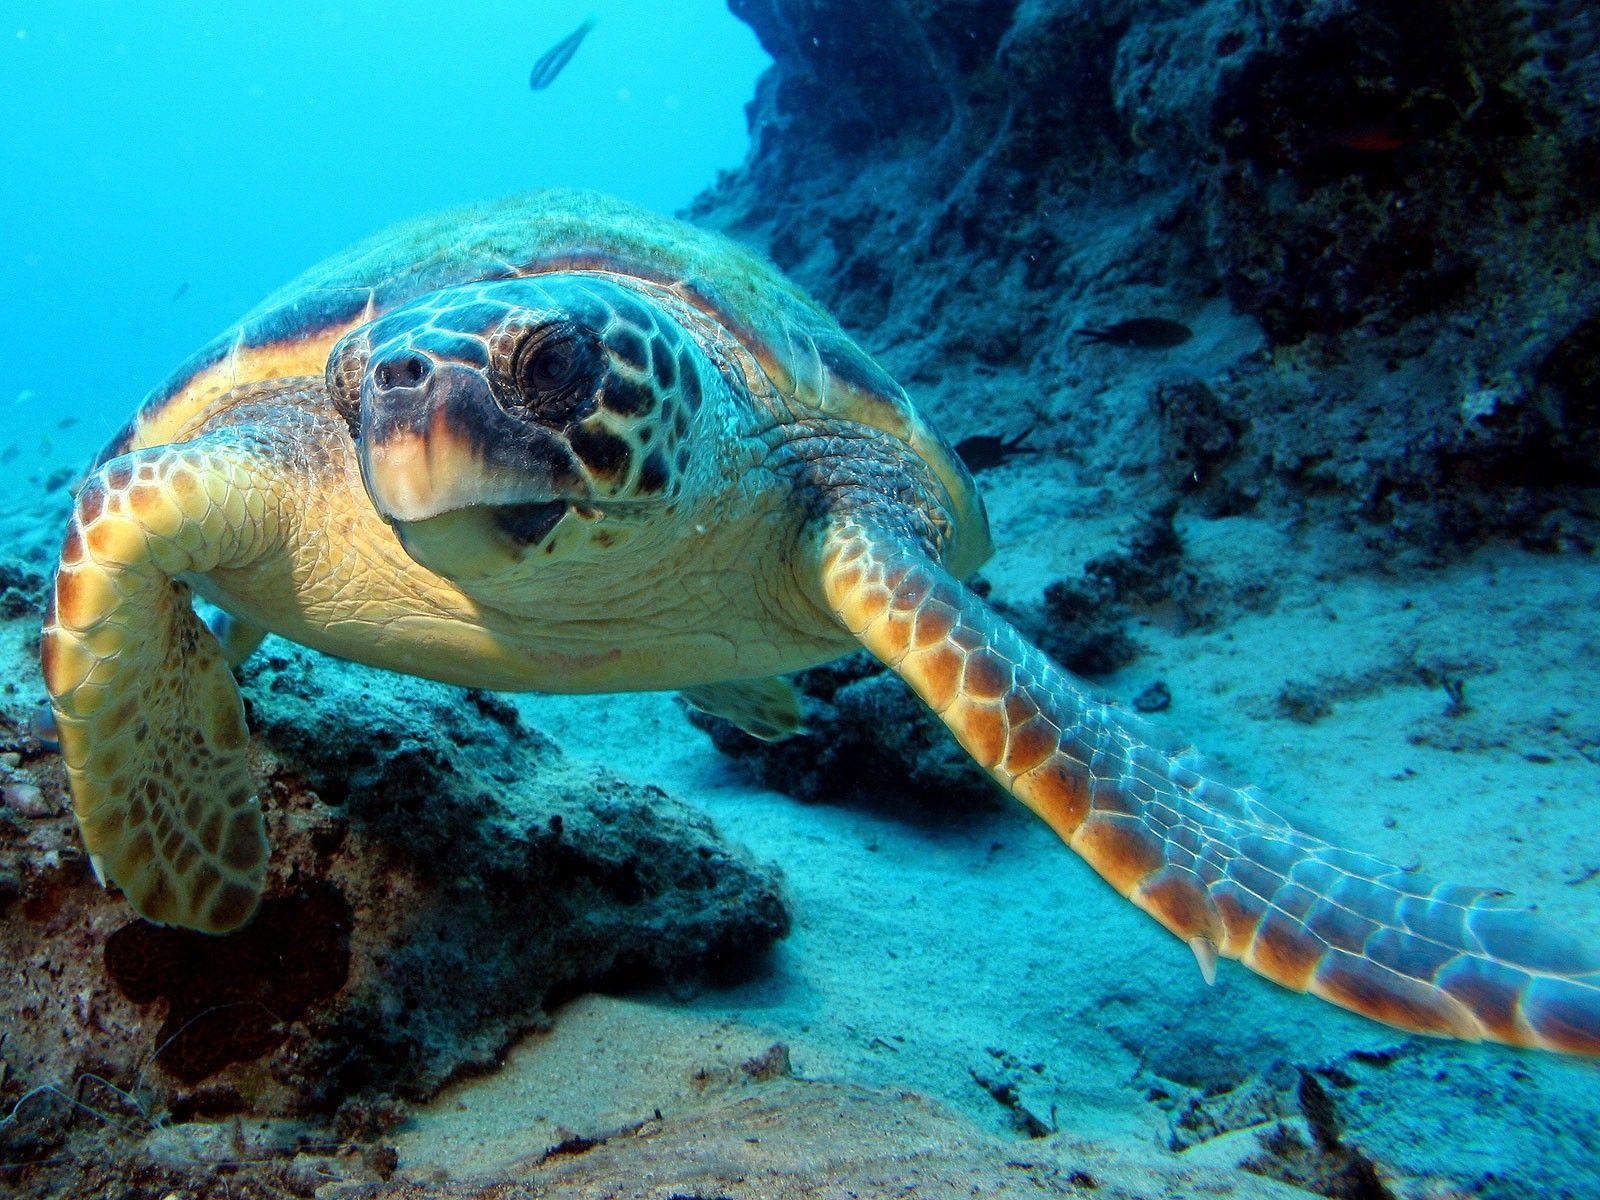 Http Freefreshwallpapers Com Wp Content Uploads 2013 01 Under The Ocean Life Wallpaper Jpg Beautiful Billede